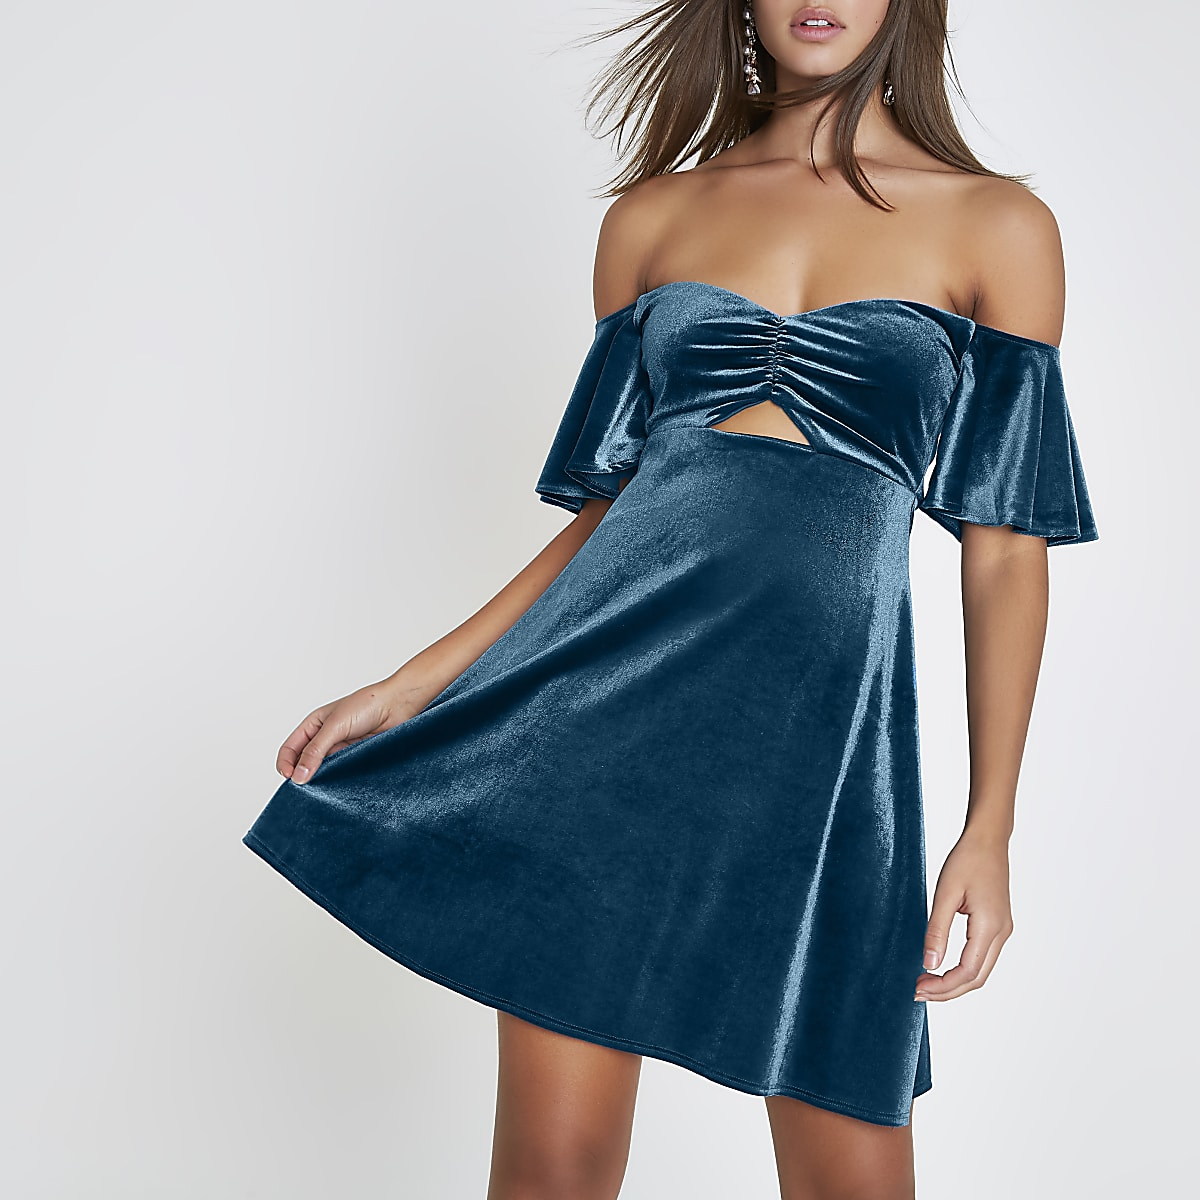 Teal velvet cut out bardot mini dress